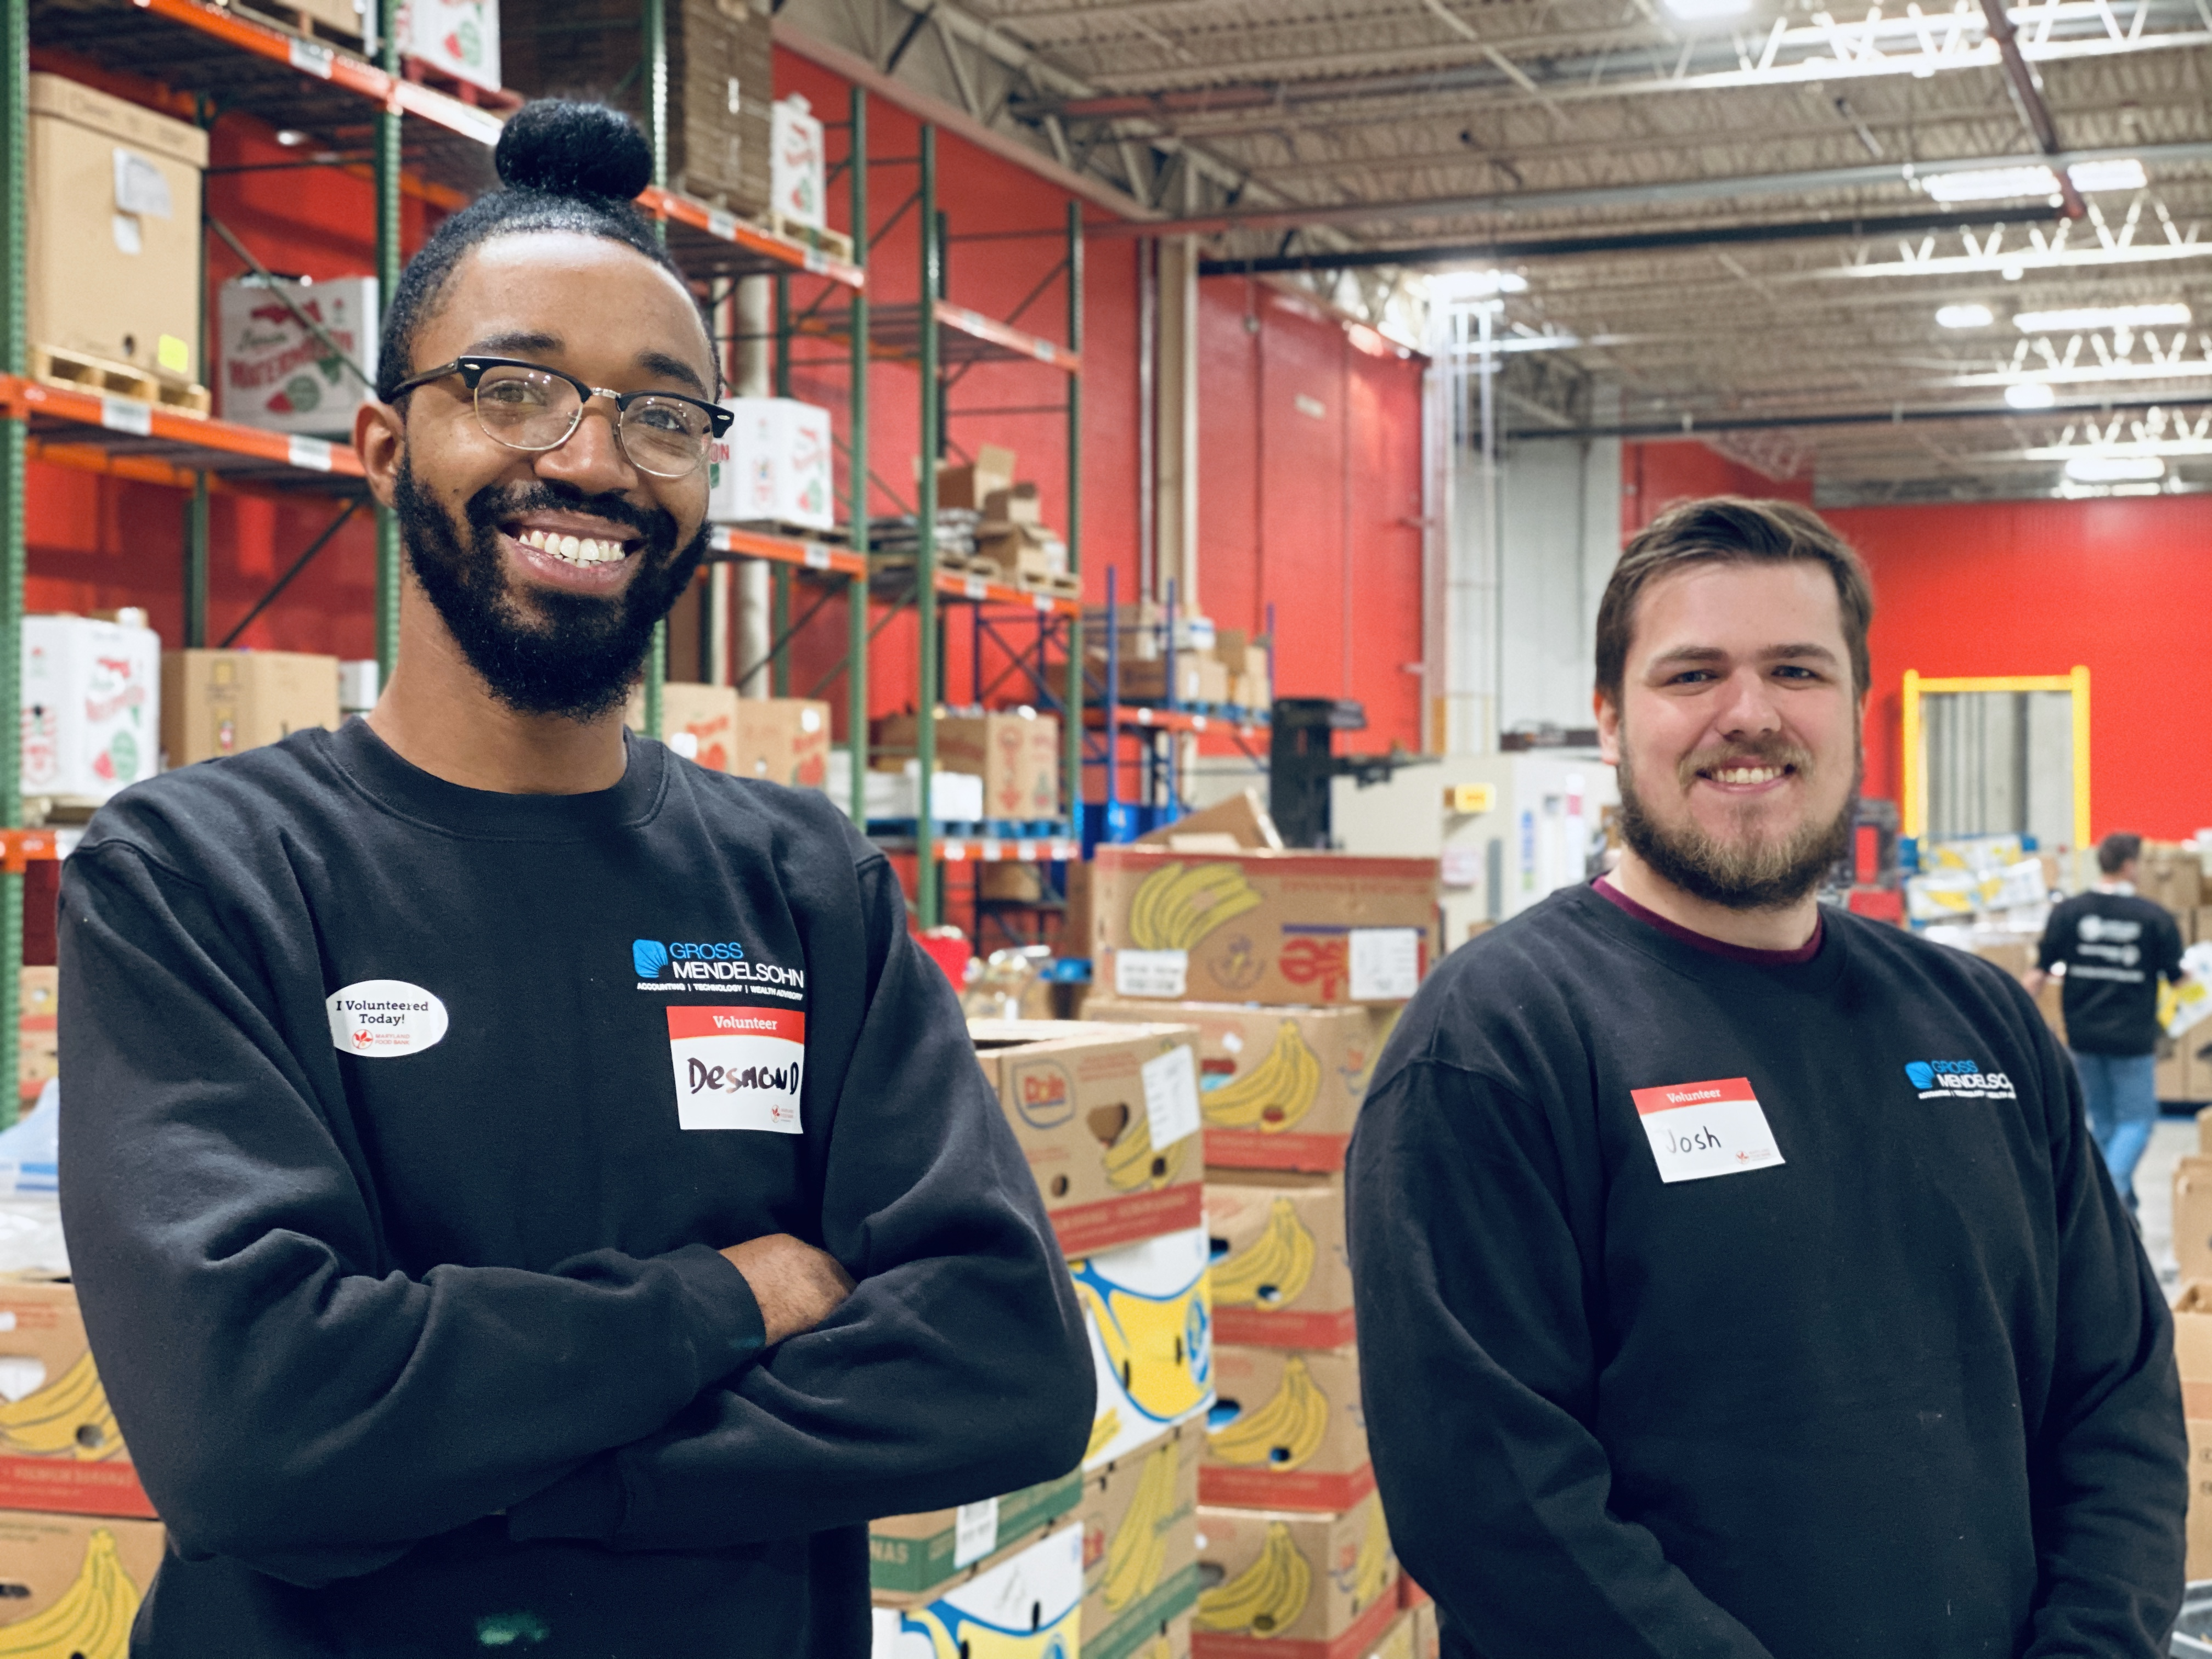 Desmond Baptiste and Joshua Council volunteer at Maryland Food Bank